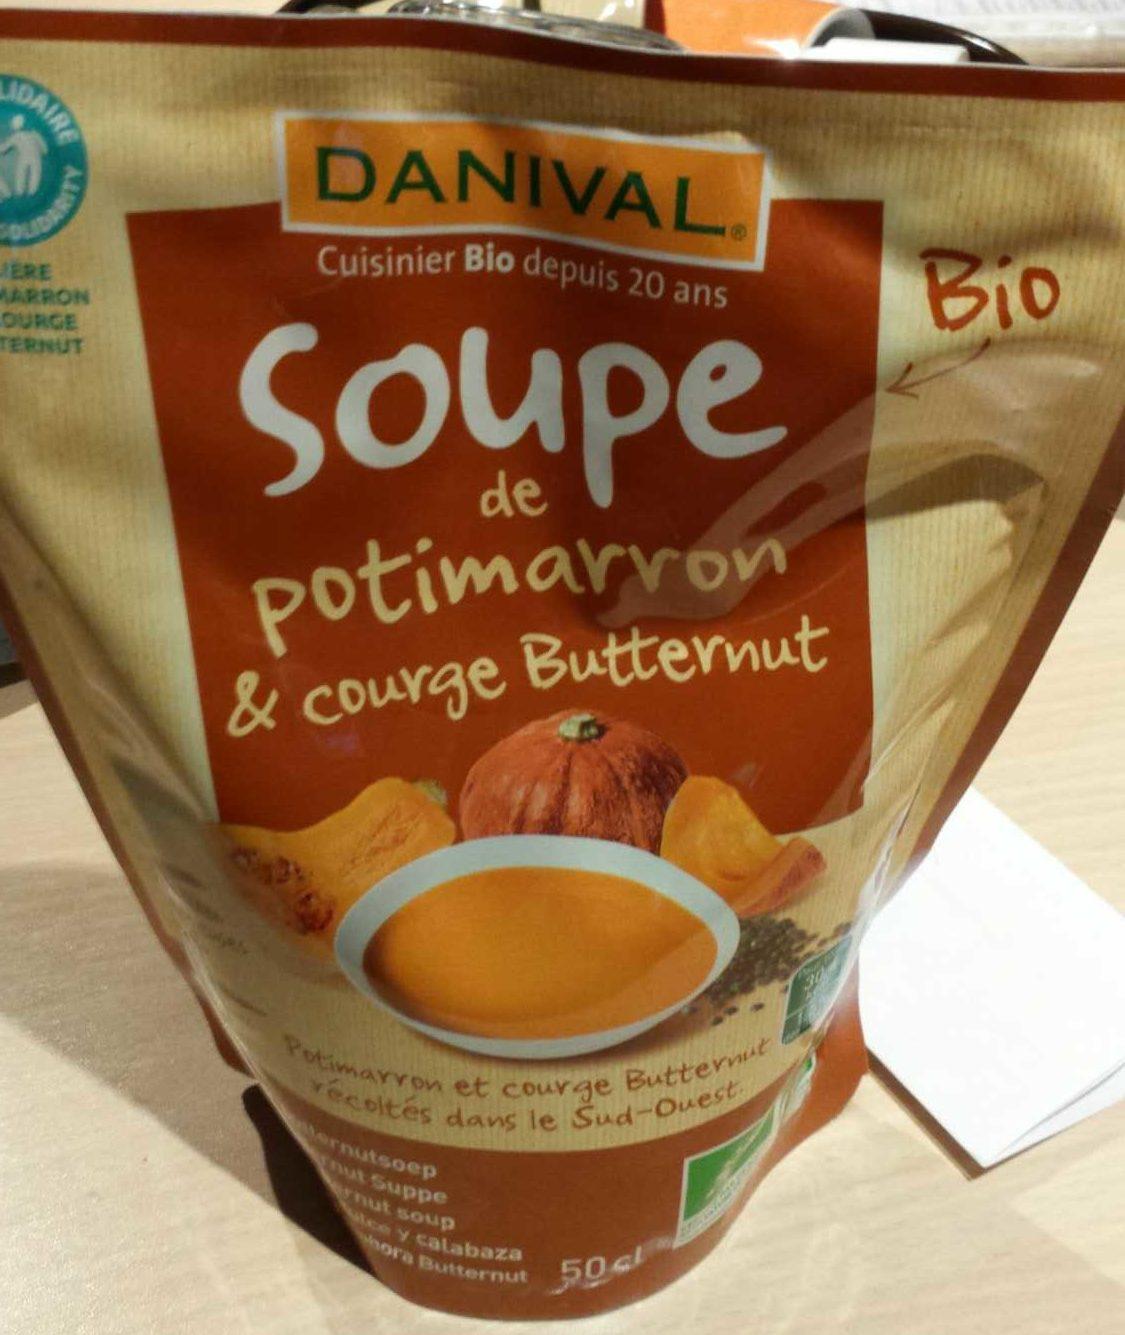 Soupe potimarron & courge butternut - Product - fr